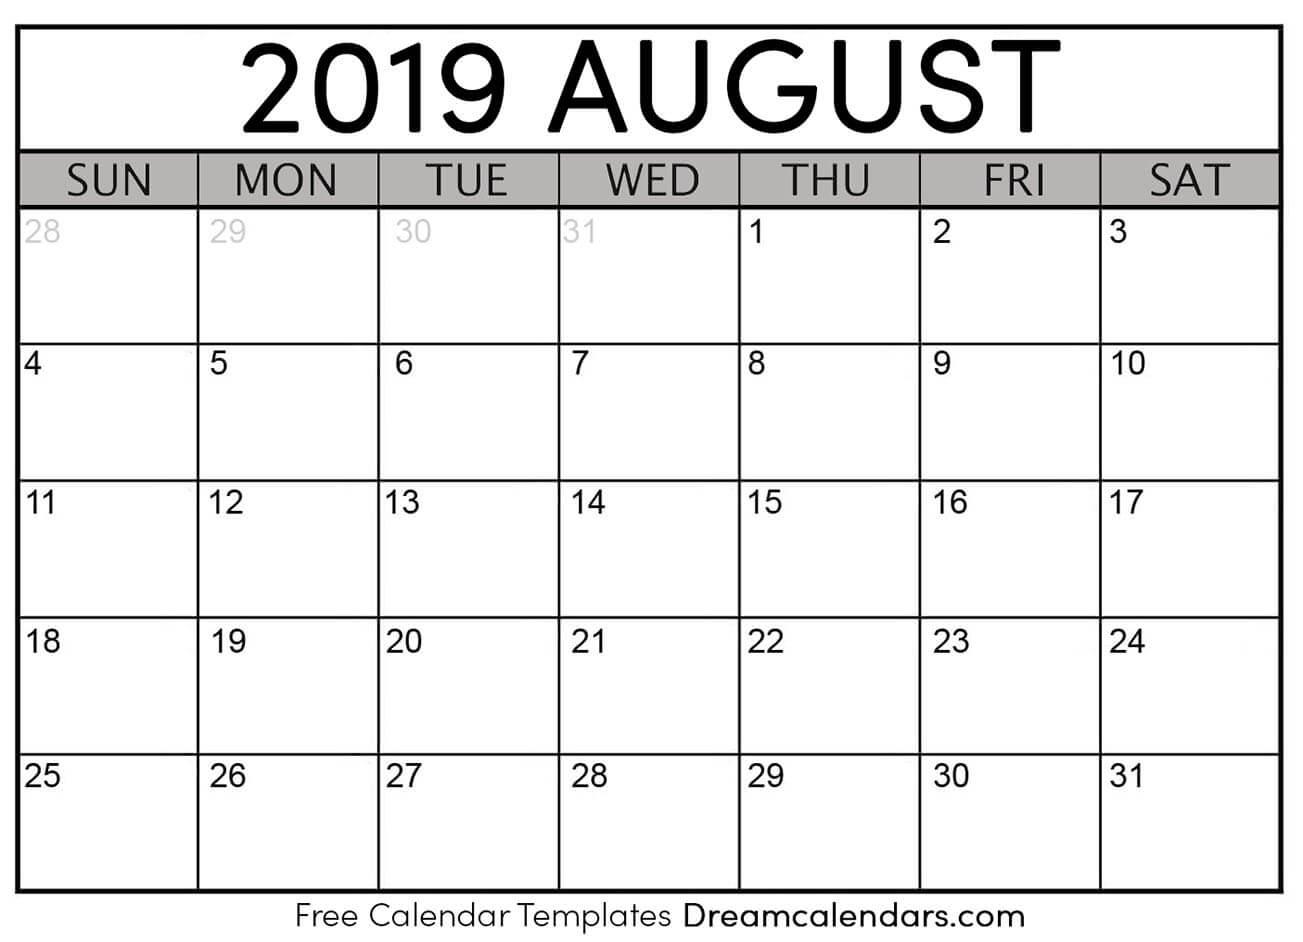 Printable August 2019 Calendar within Null Blank Calendar To Print